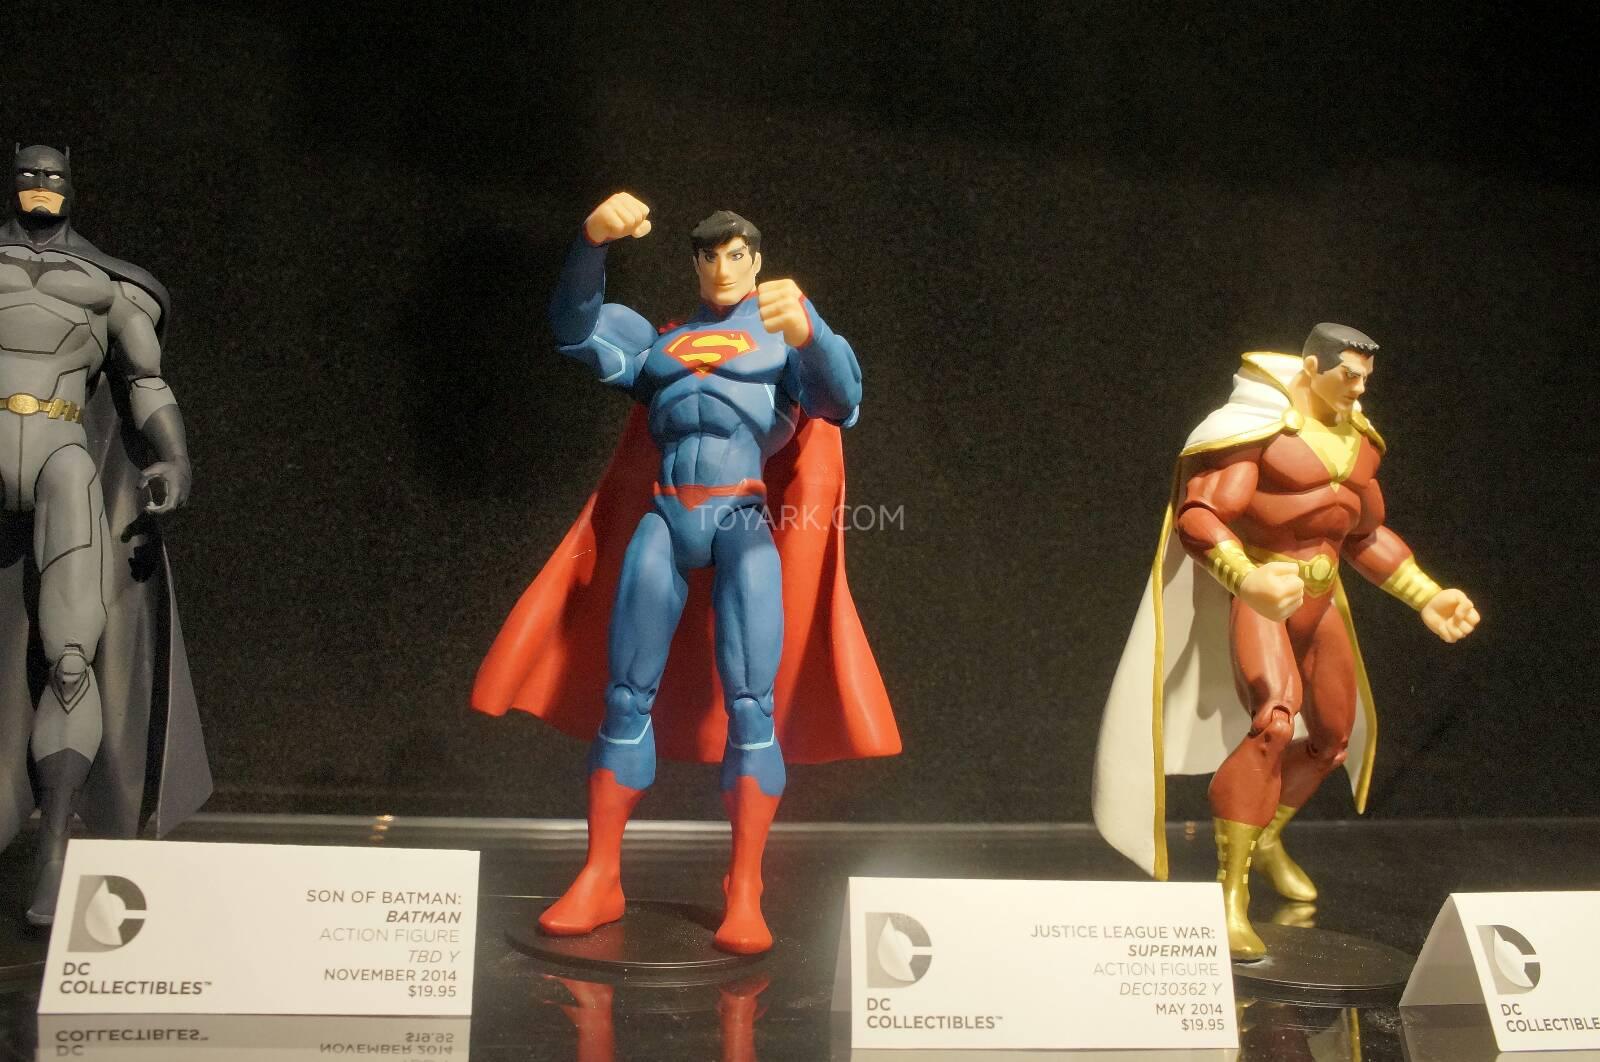 [Toy Fair 2014] DC Collectibles Toy-Fair-2014-DC-Collectibles-131